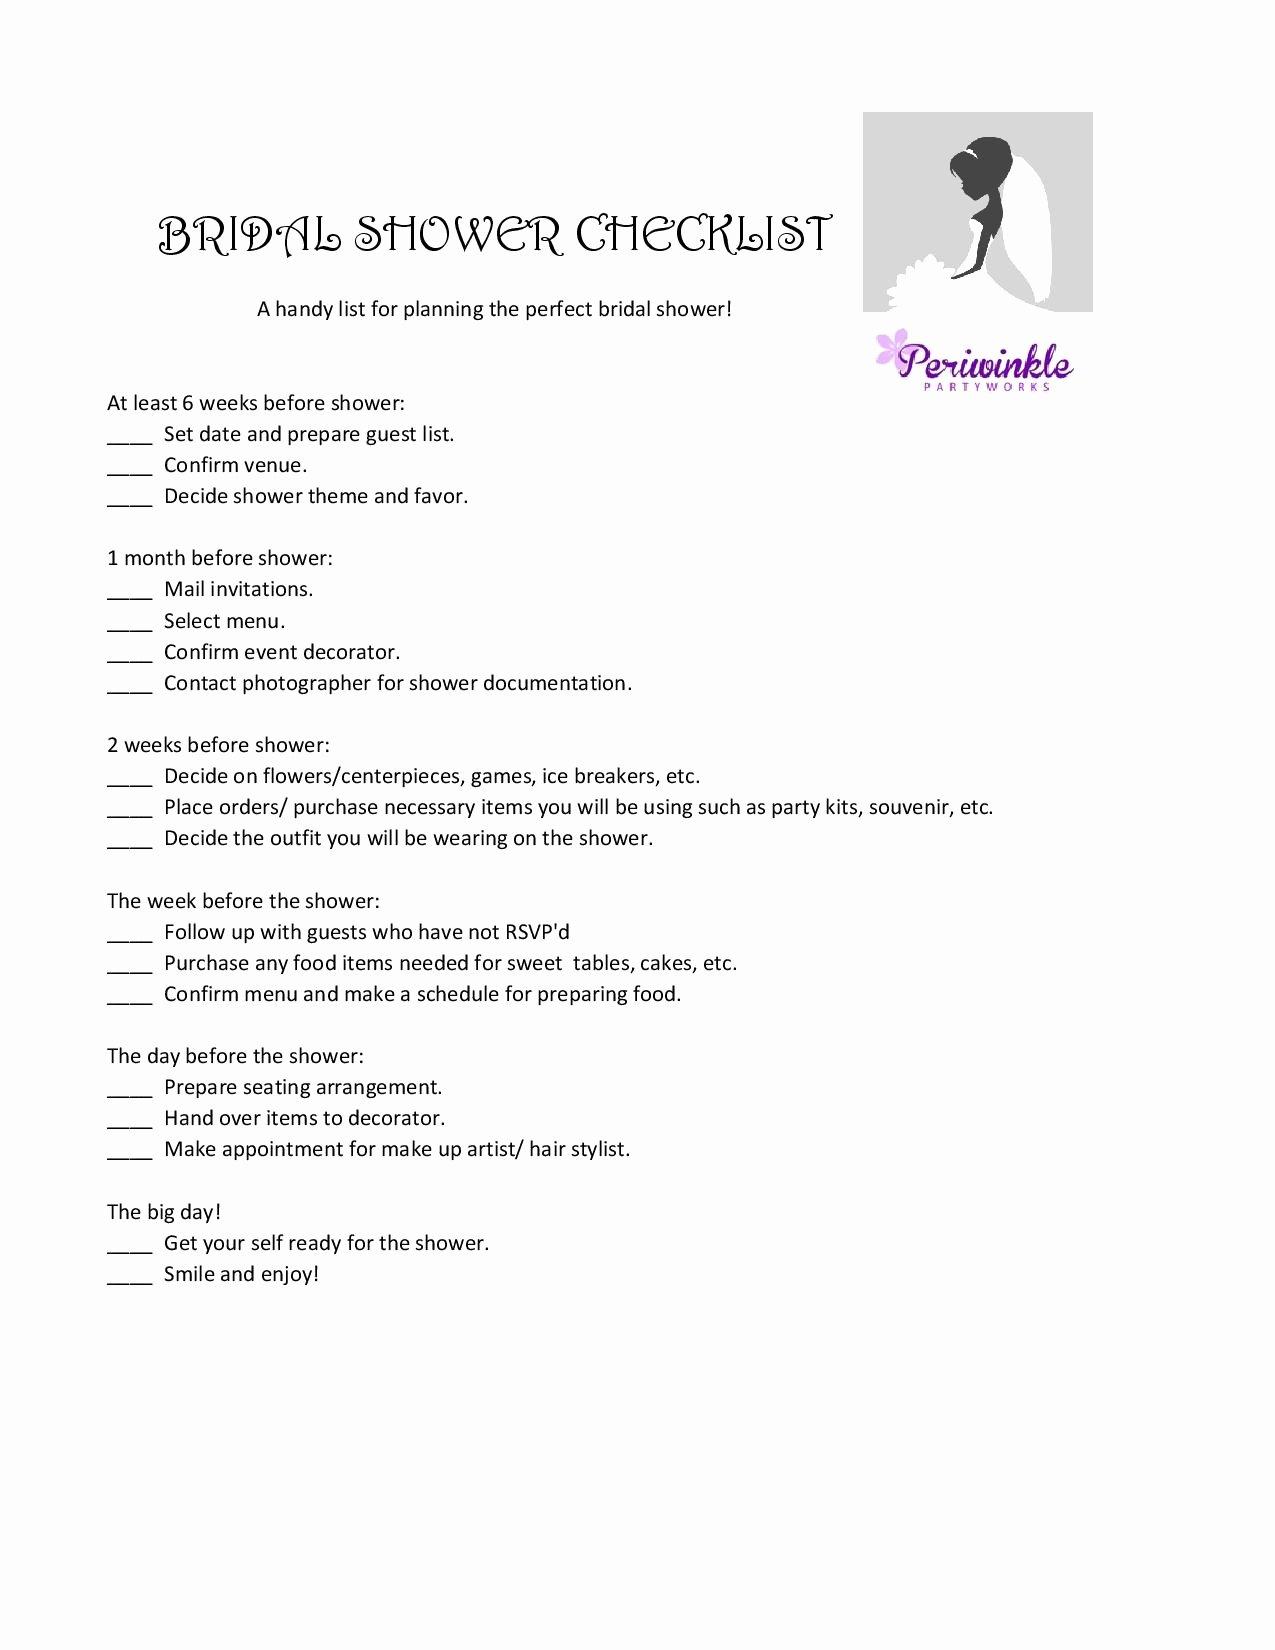 Bridal Shower Checklist Template Best Of Party Planning Checklist Best Image